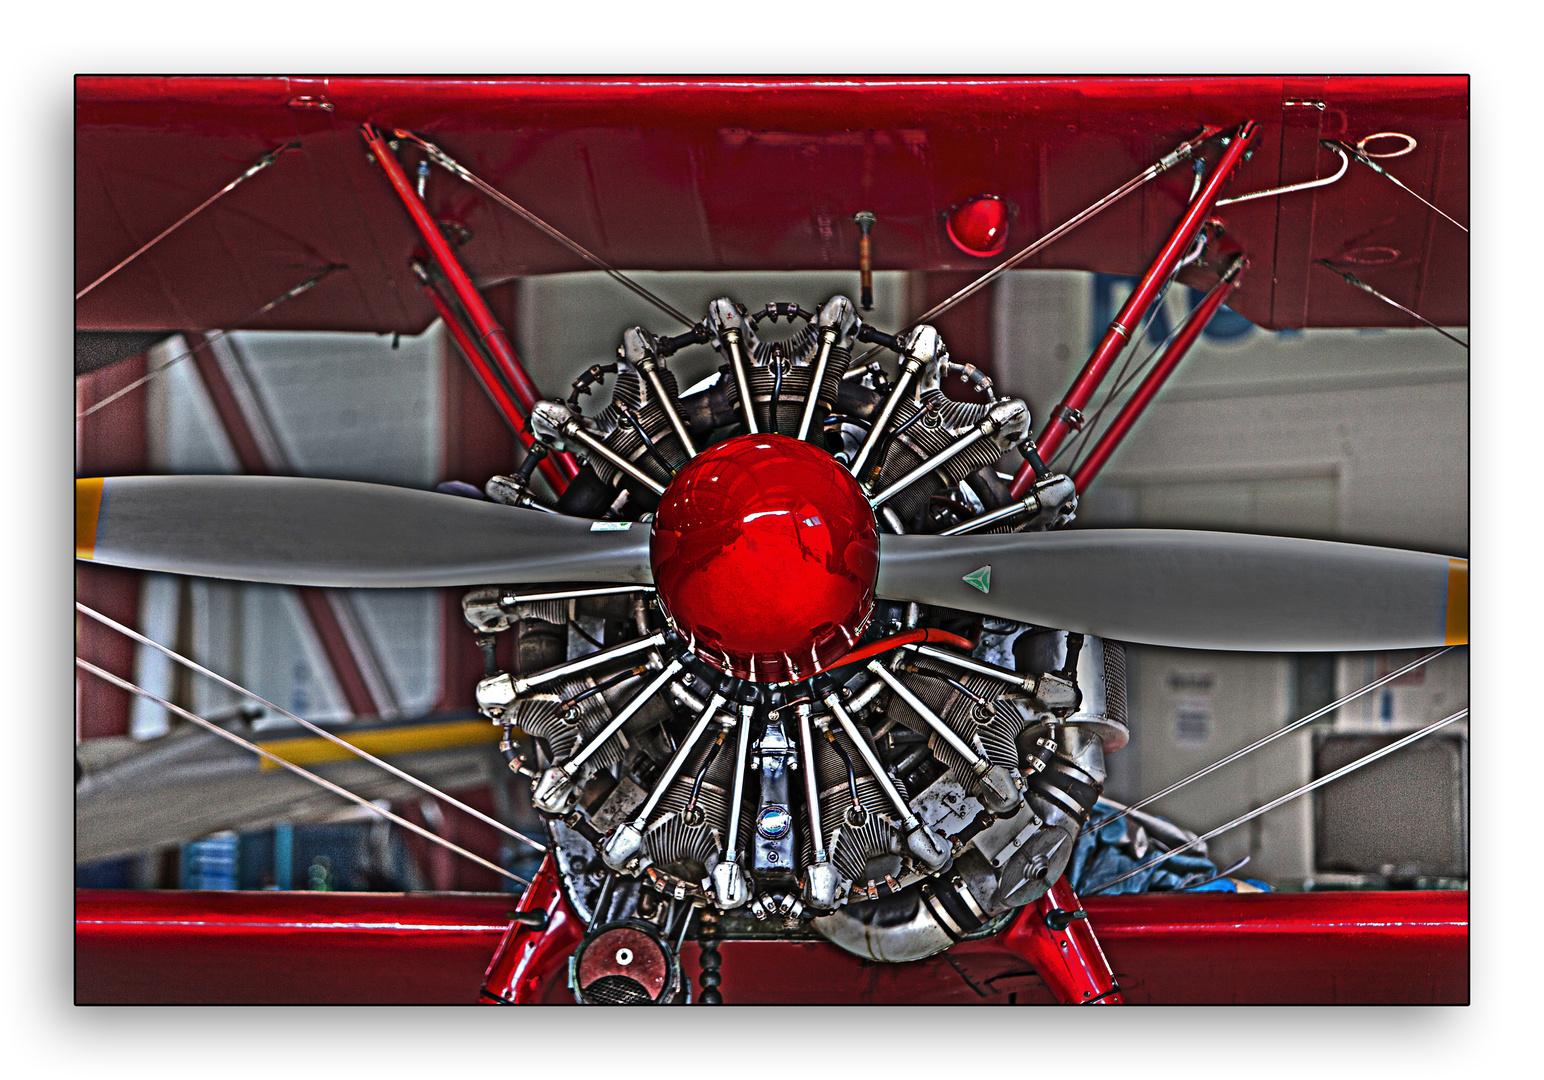 Sternmotor in HDR